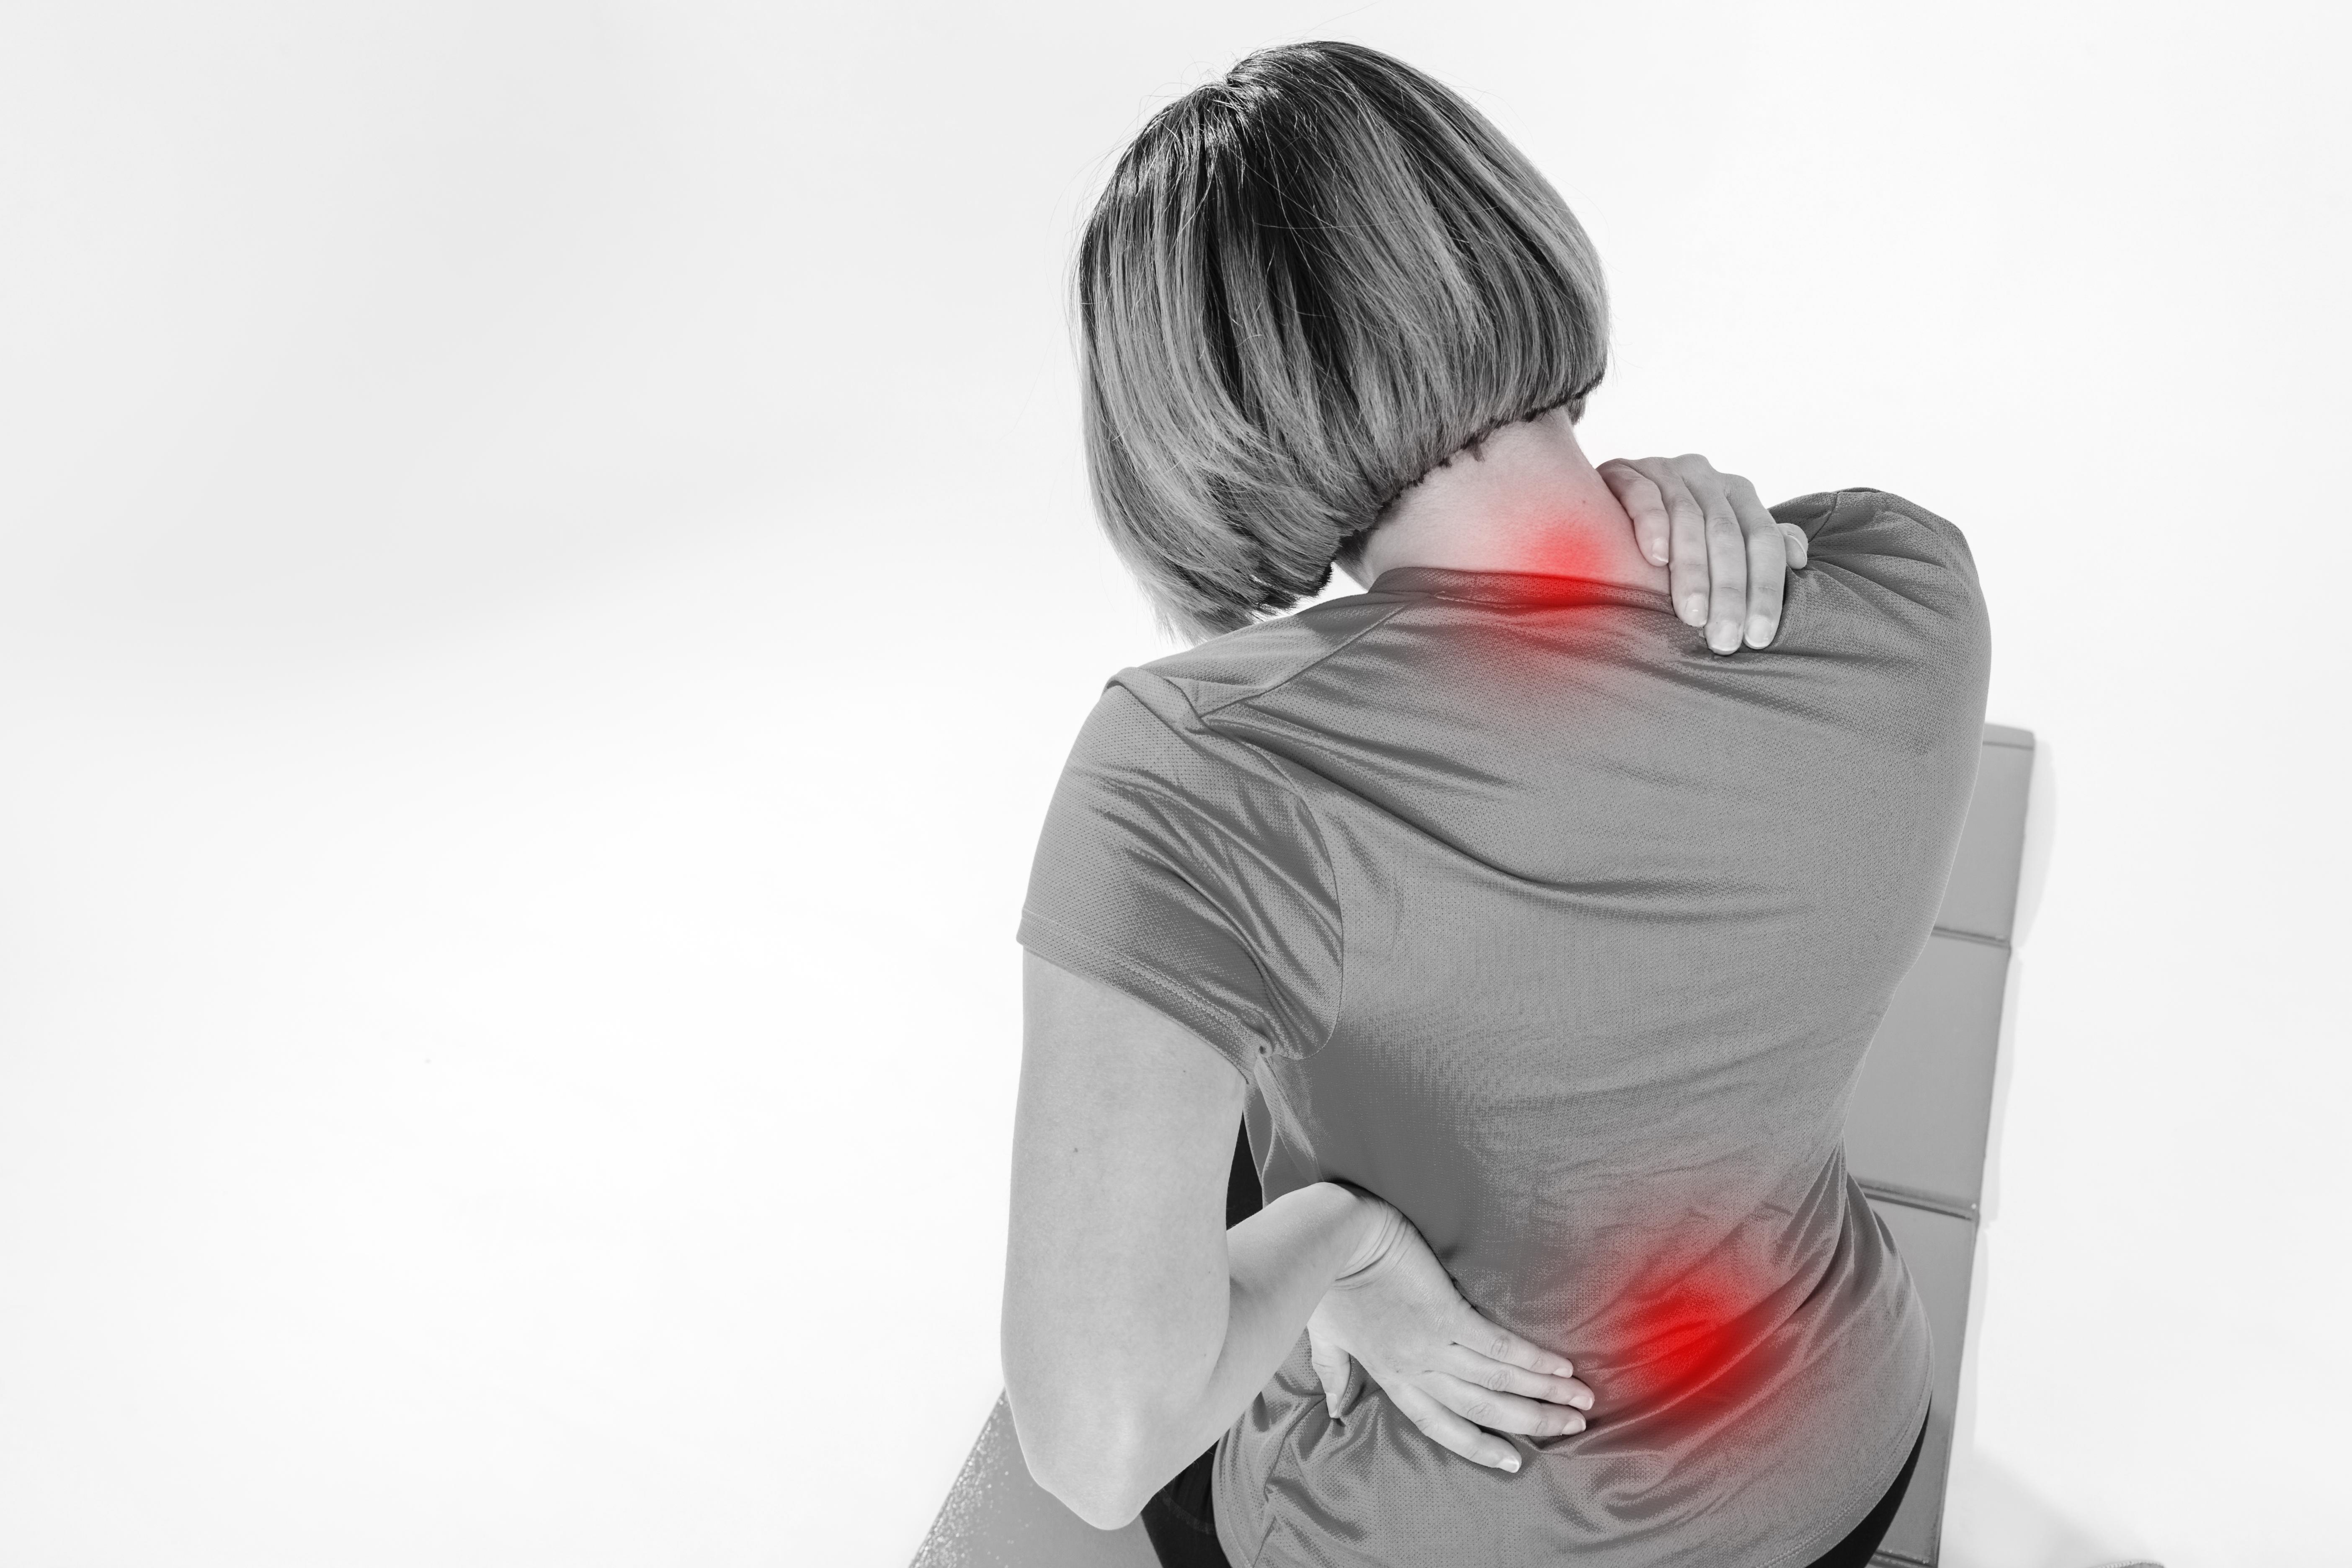 Enfermedades reumáticas: ¿existe un abordaje integral?